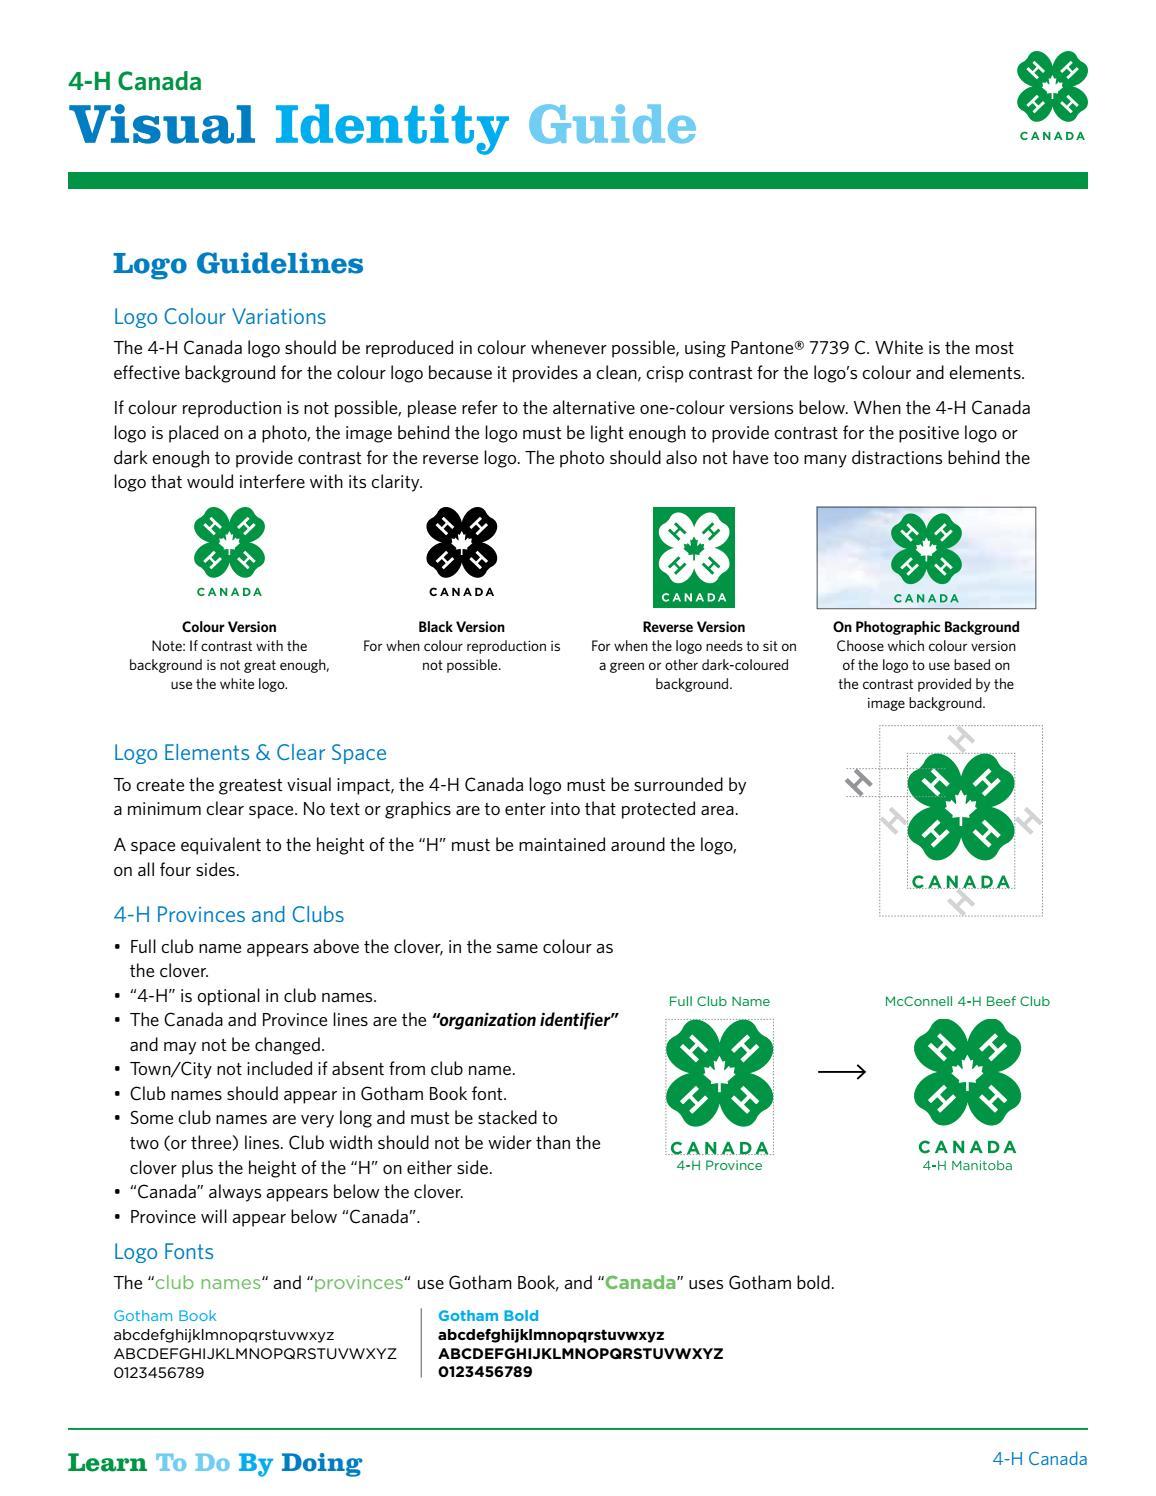 4-H Canada Visual Identity Guide by 4-H Canada - issuu